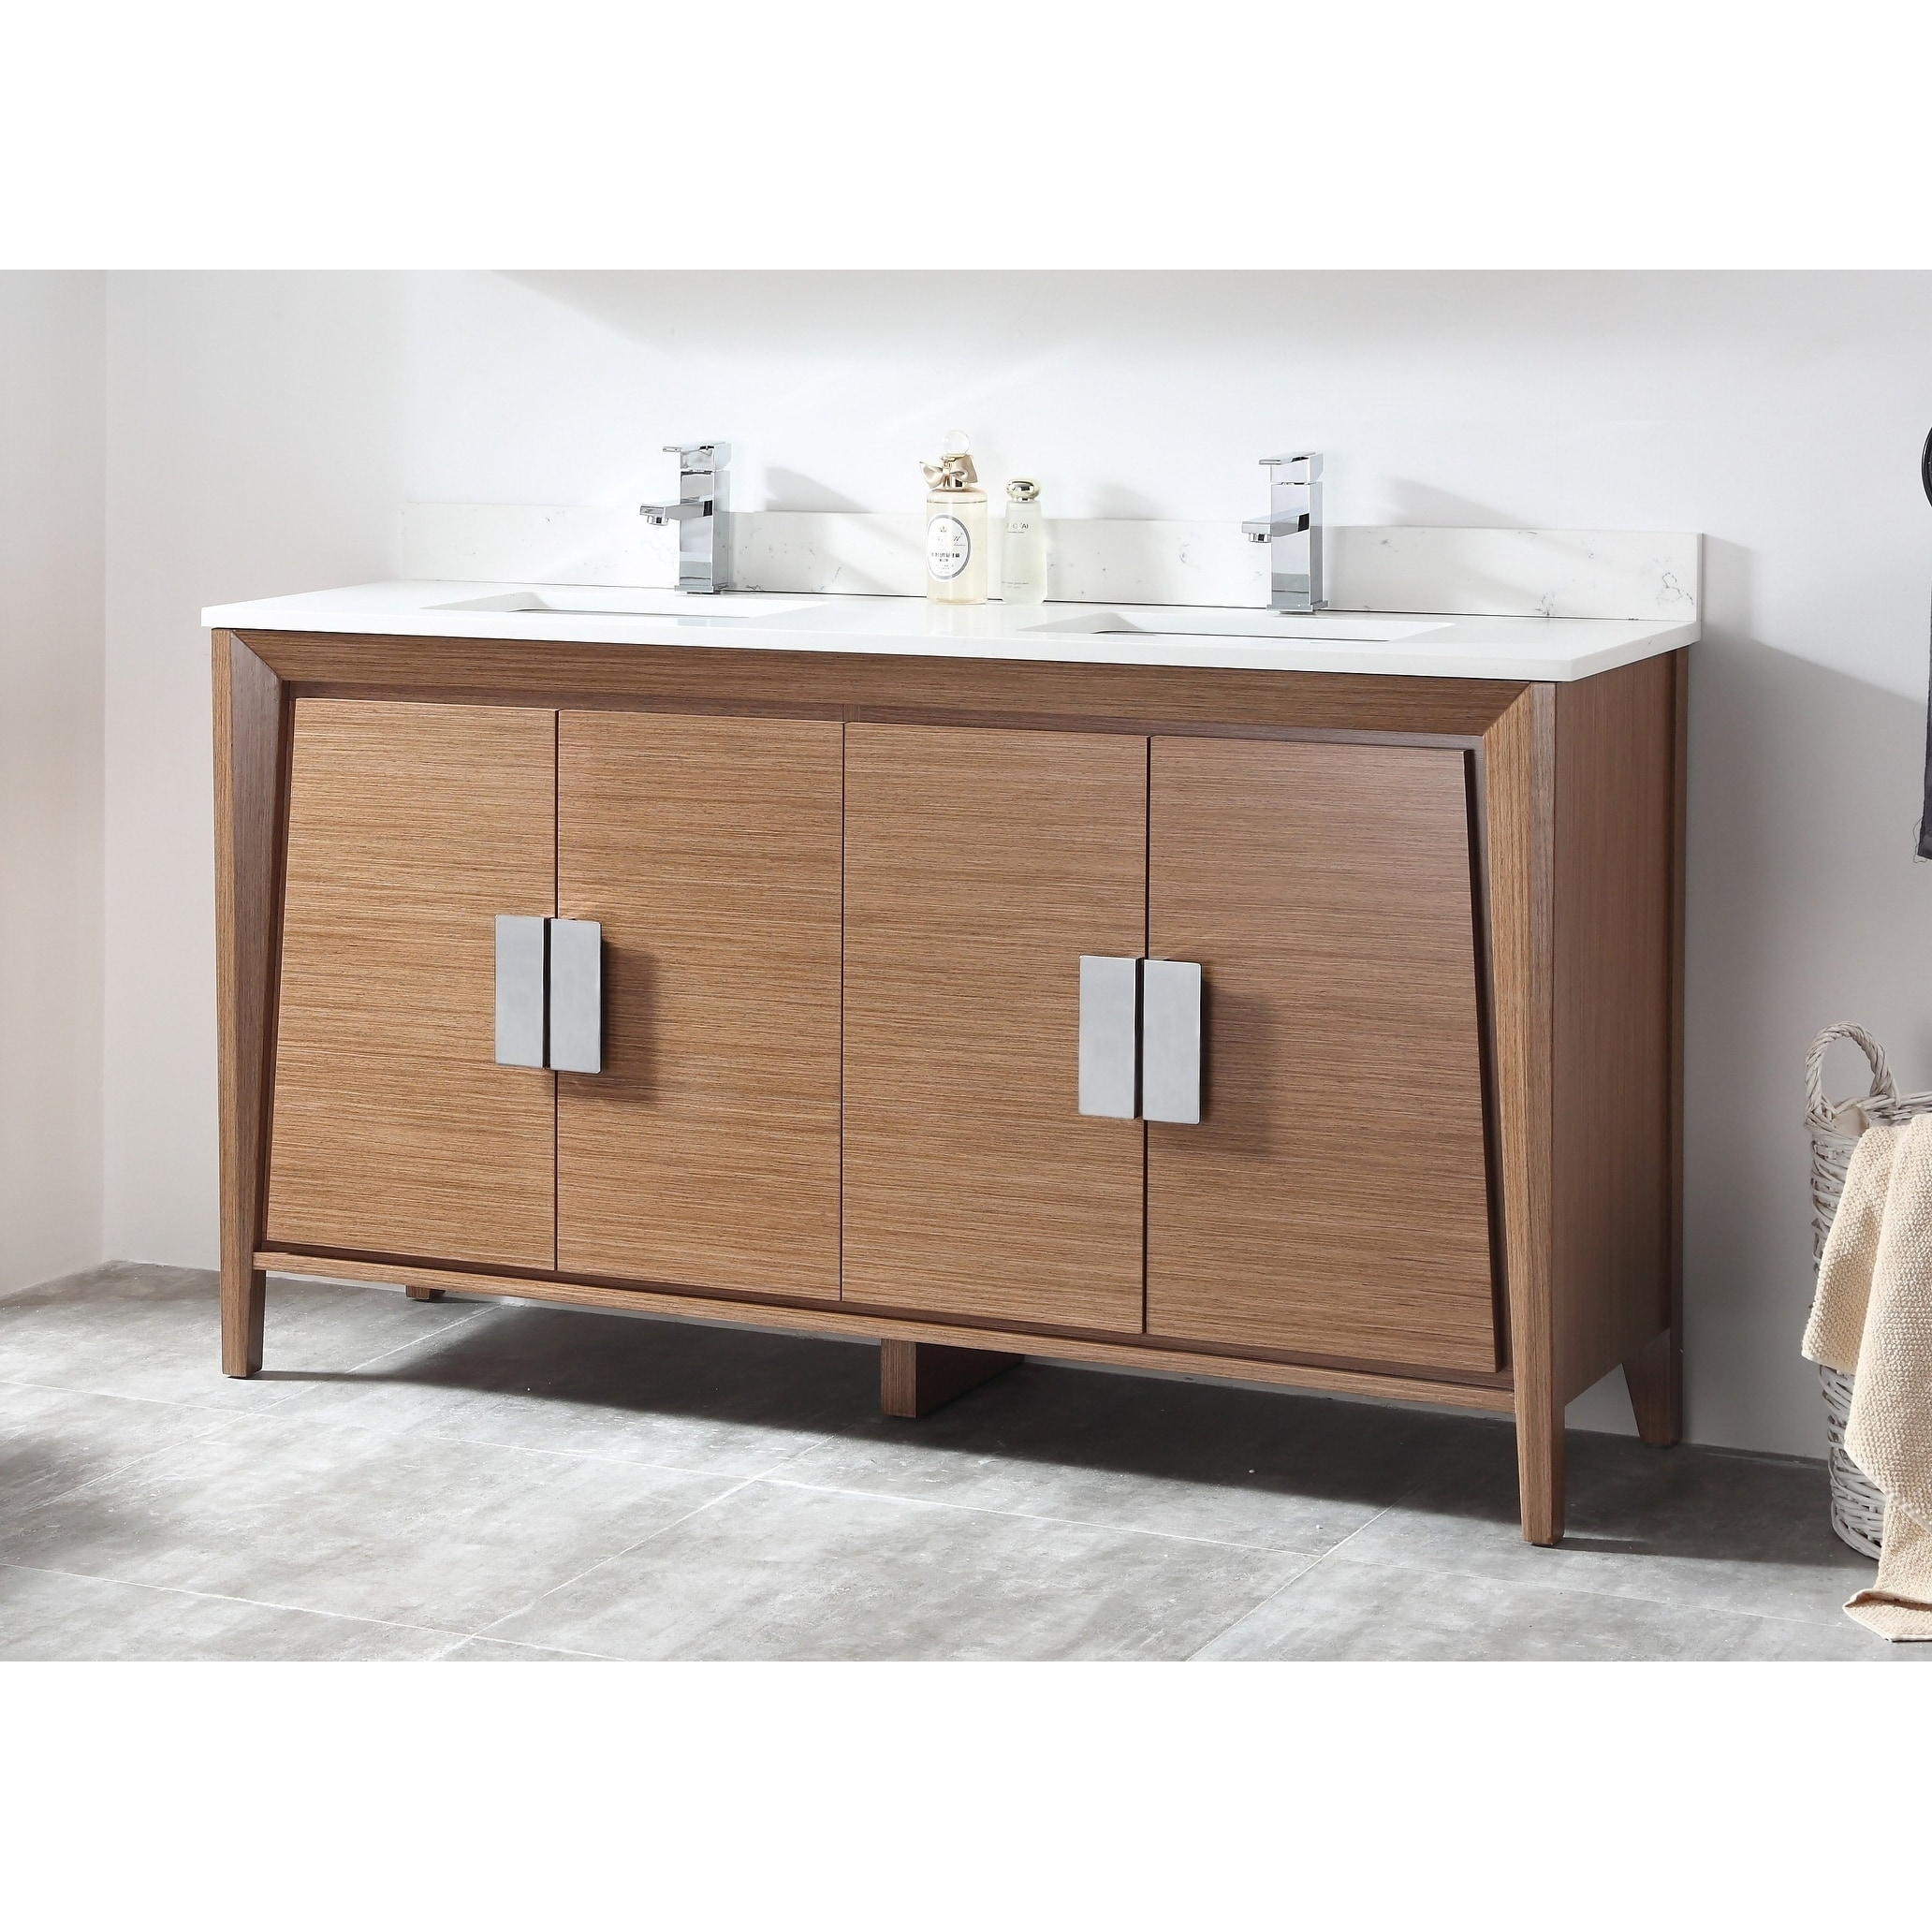 60 Tennant Brand Larvotto Light Wheat Double Sink Bathroom Vanity Overstock 26275628